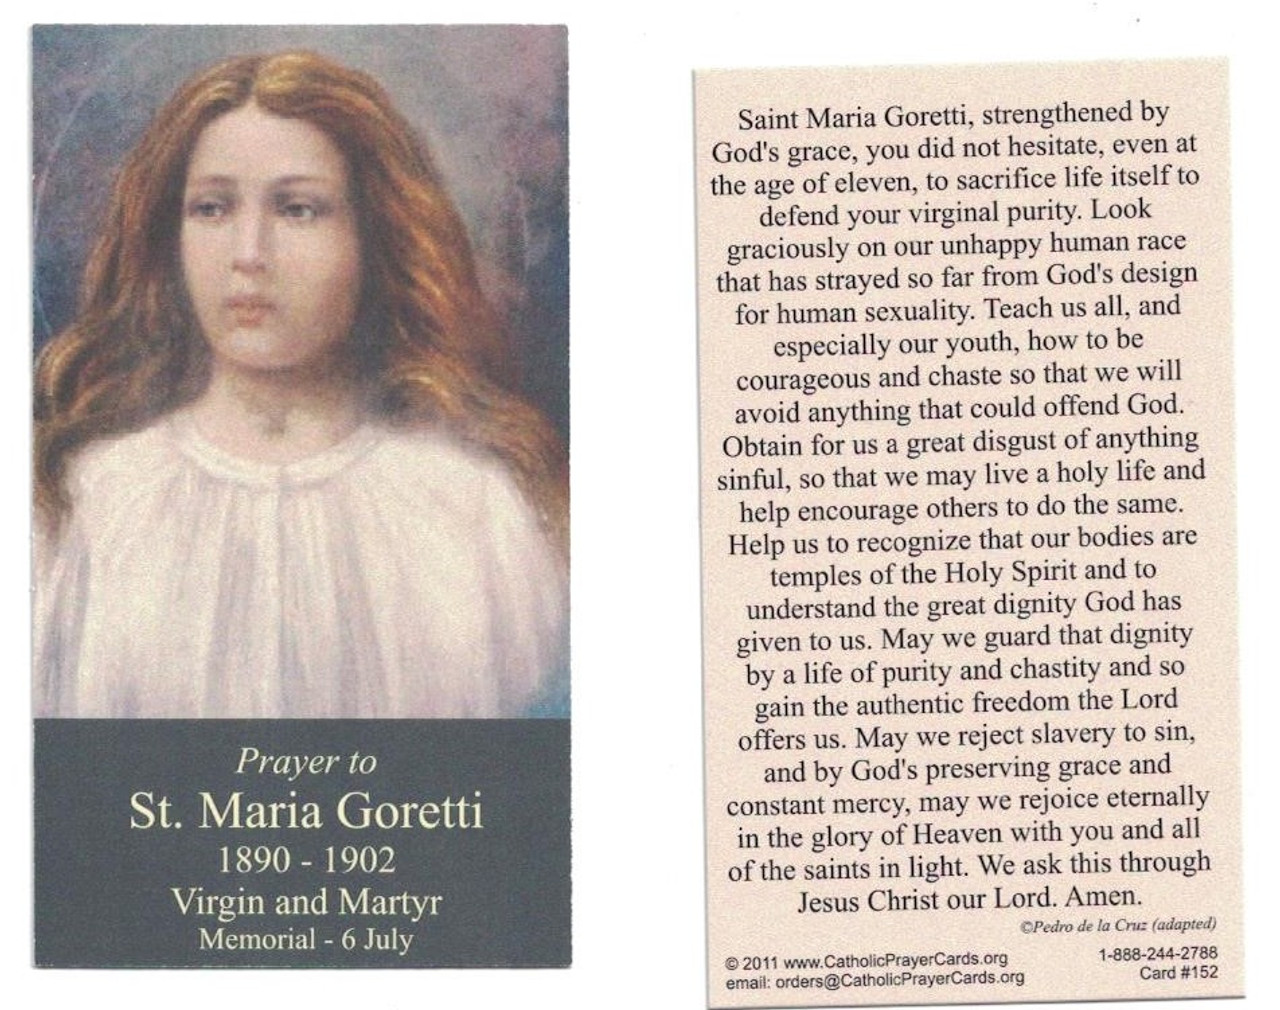 ST MARIA GORETTI PRAYER CARD SET CATHOLIC SAINT PATRON SAINT OF YOUTH YOUNG WOMEN